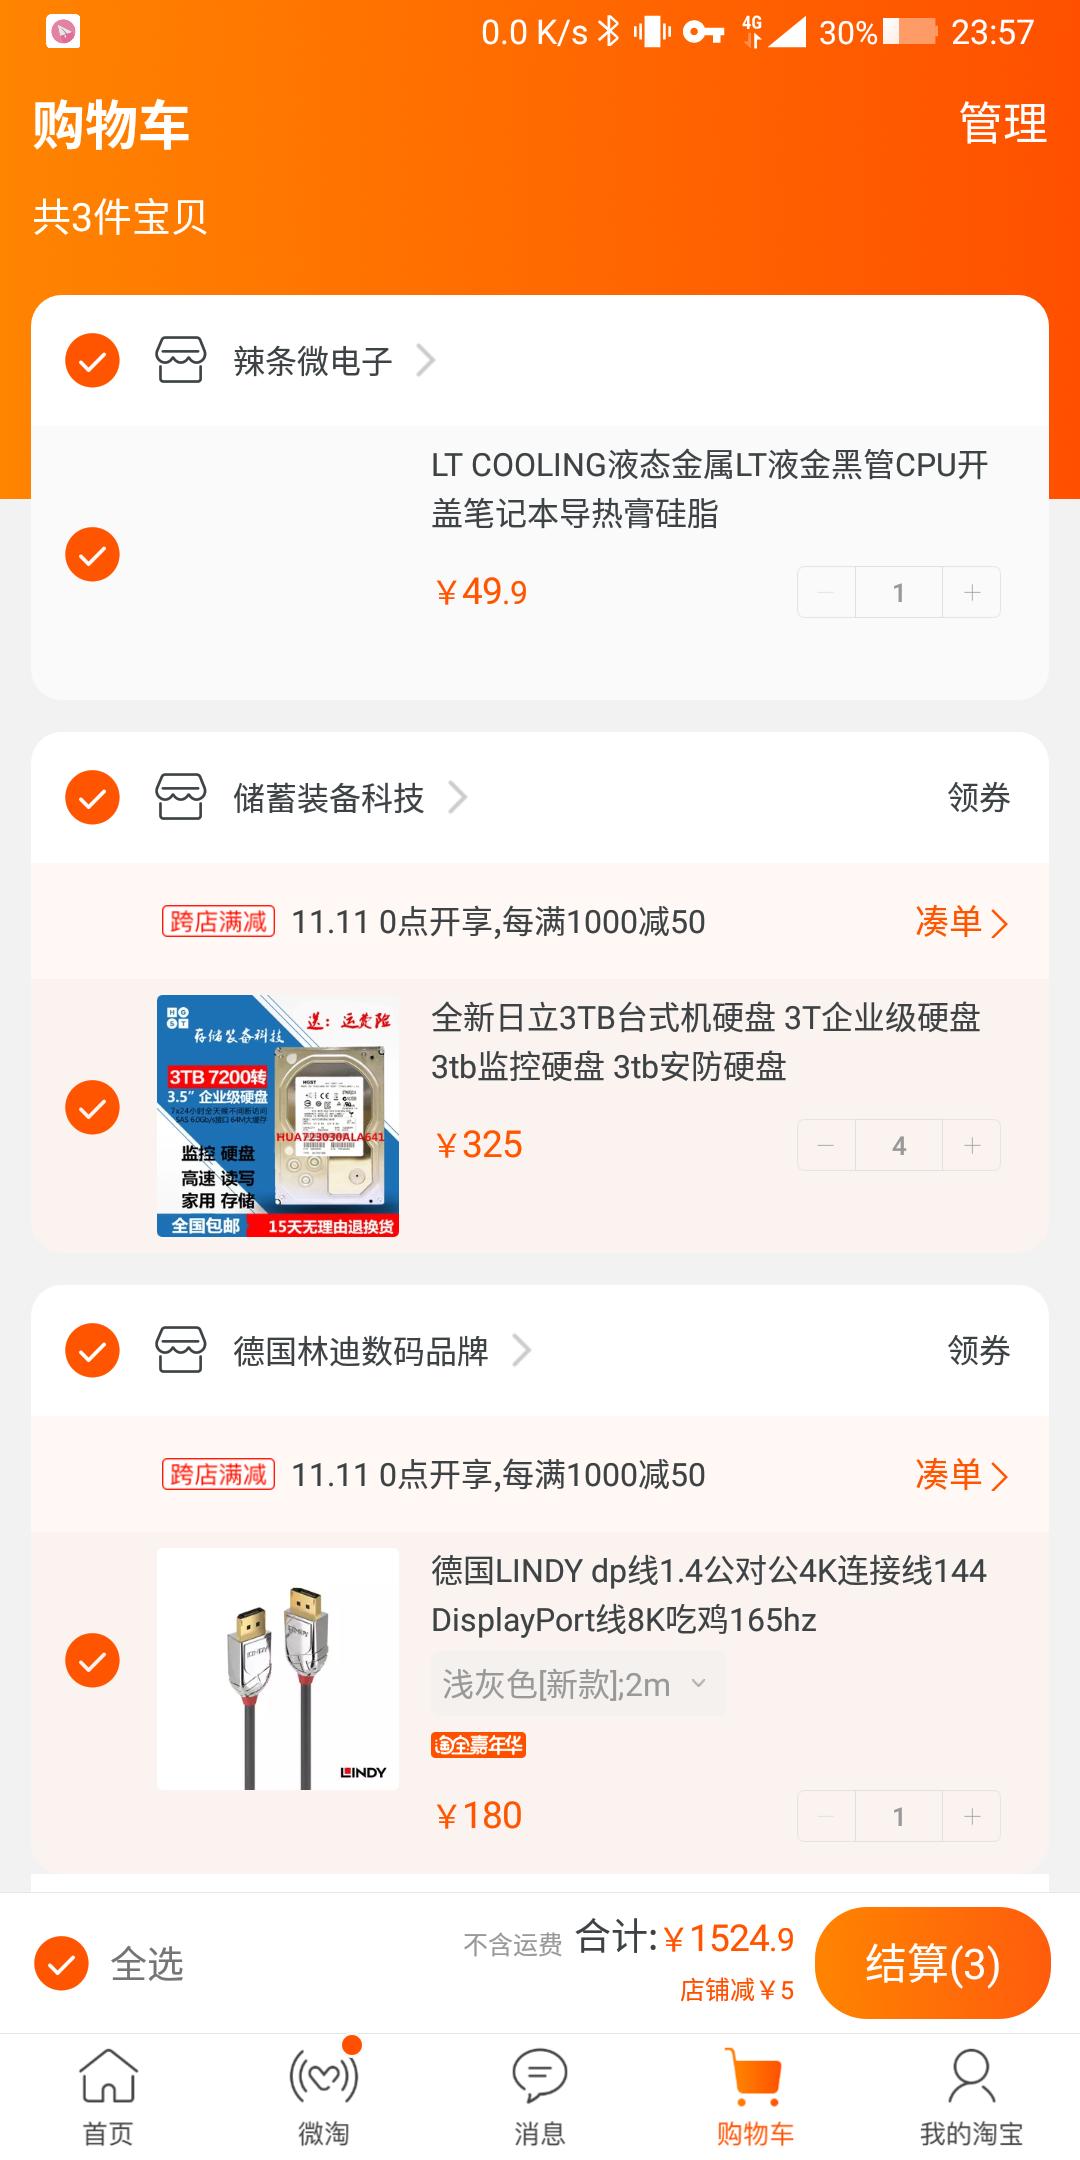 0_1541260792737_Screenshot_2018-11-03-23-57-46-774_com.taobao.taobao.png